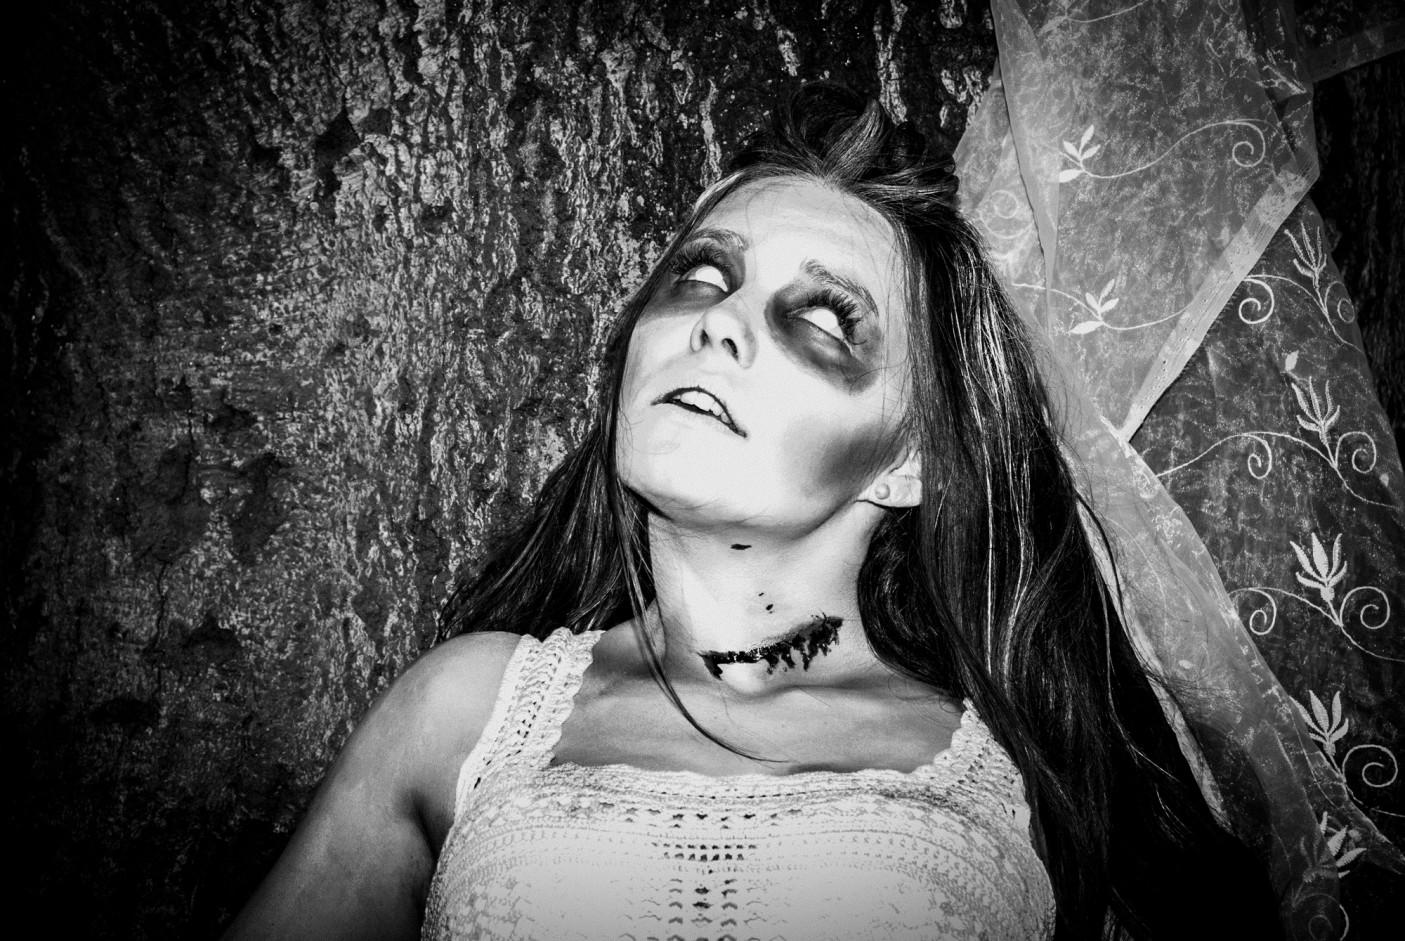 Daria halloween (31 of 50)